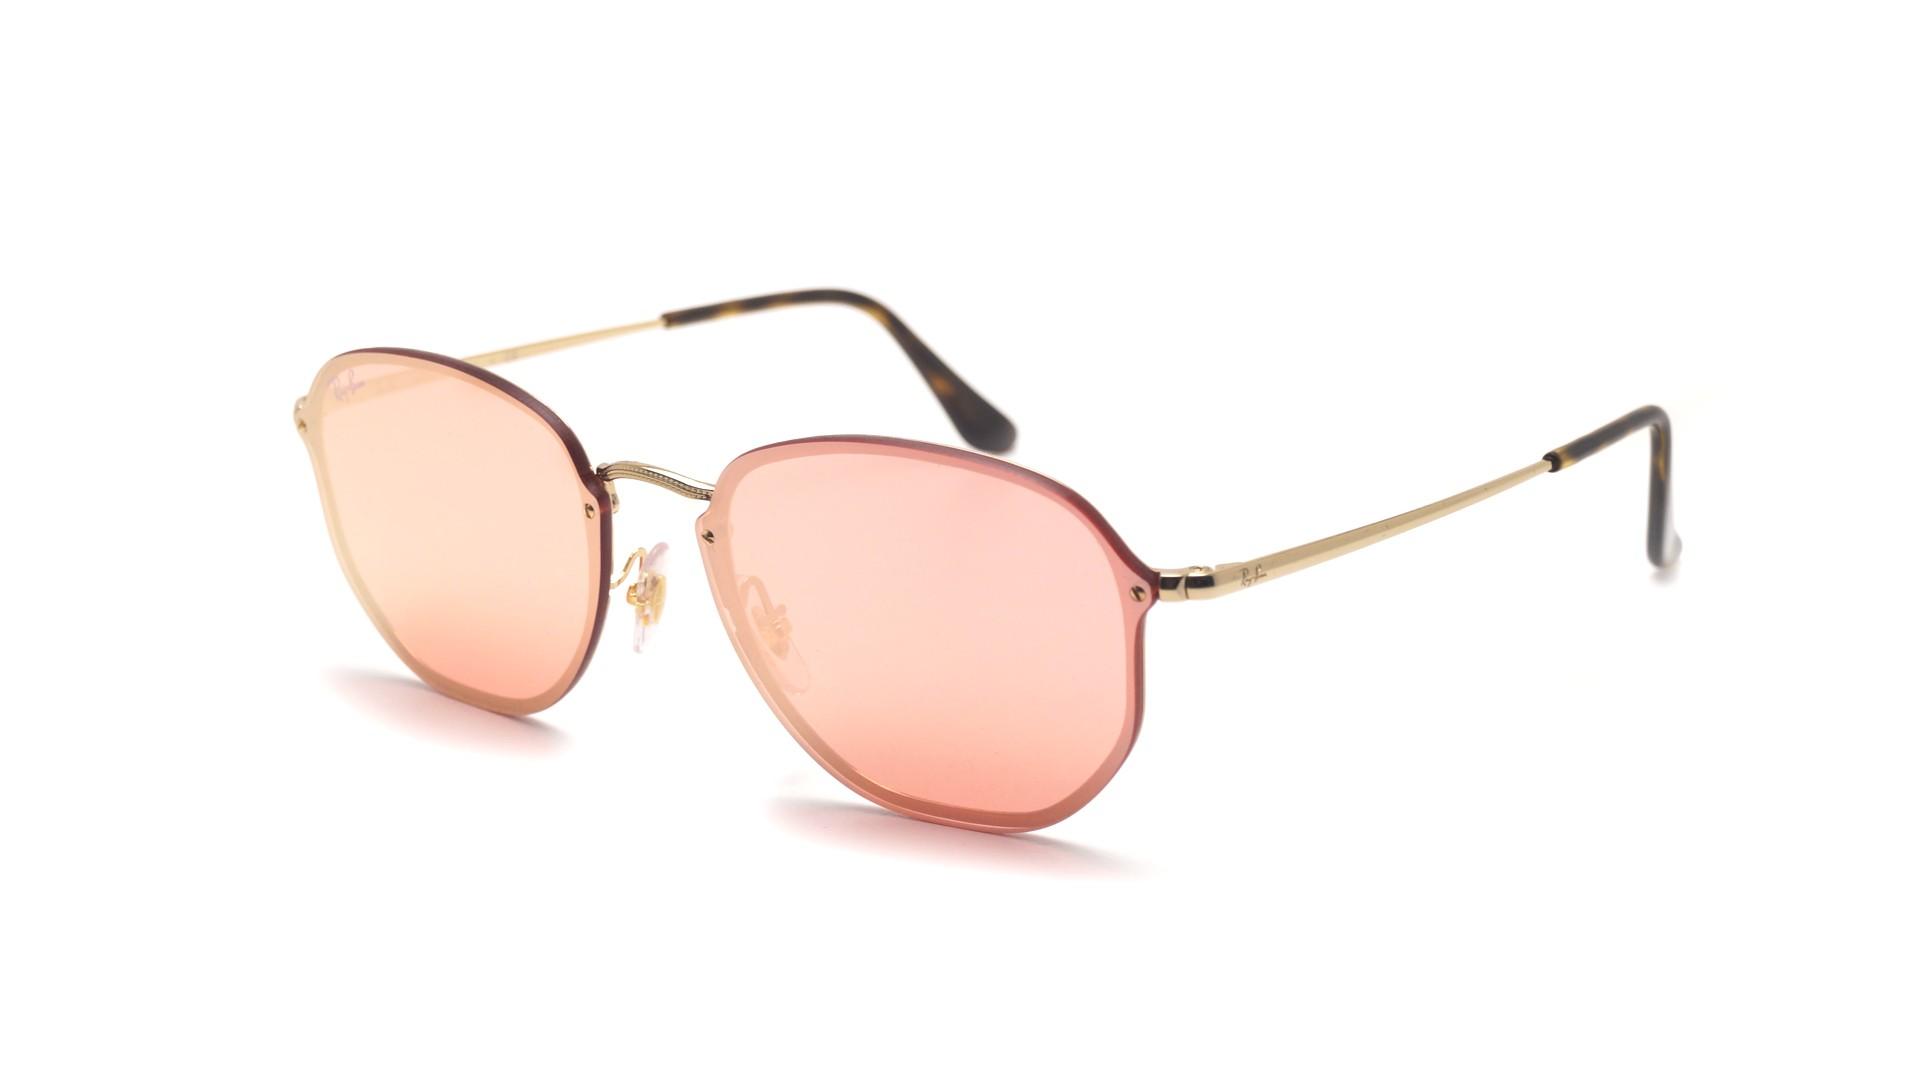 87d8676d91 Sunglasses Ray-Ban Hexagonal Blaze Gold RB3579N 001 E4 58-15 Large Mirror